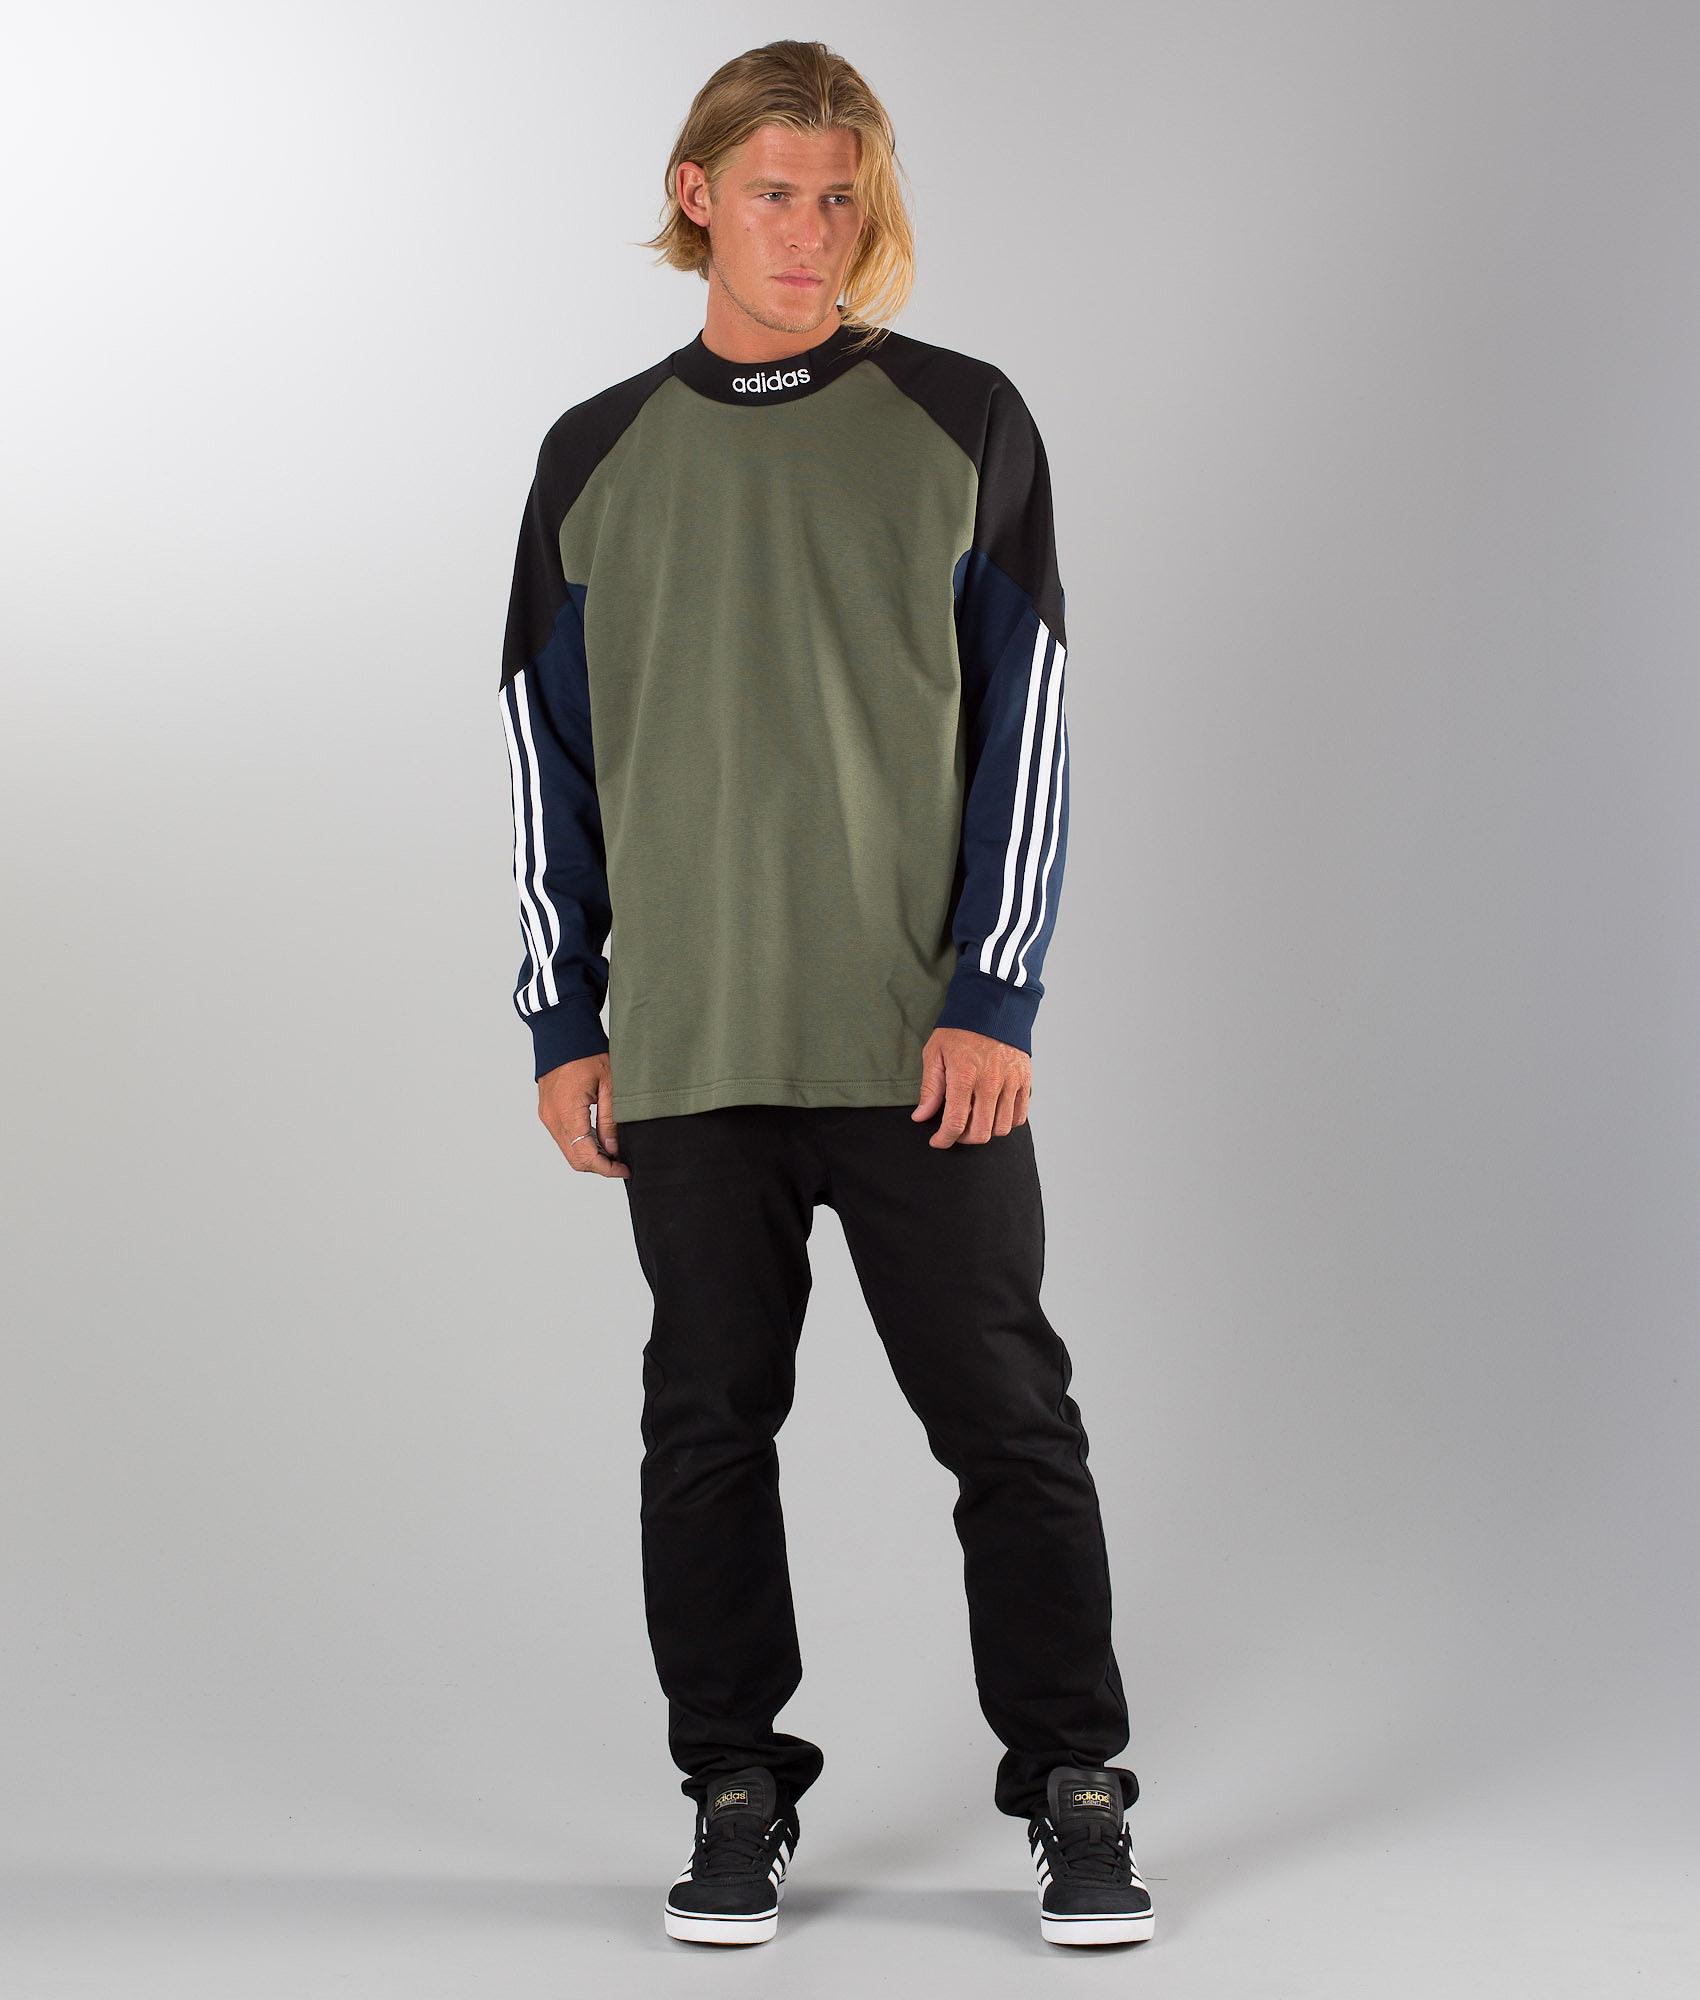 001cfec7c78 Adidas Skateboarding Goalie Sweater Base Green/Black/Collgegiate ...